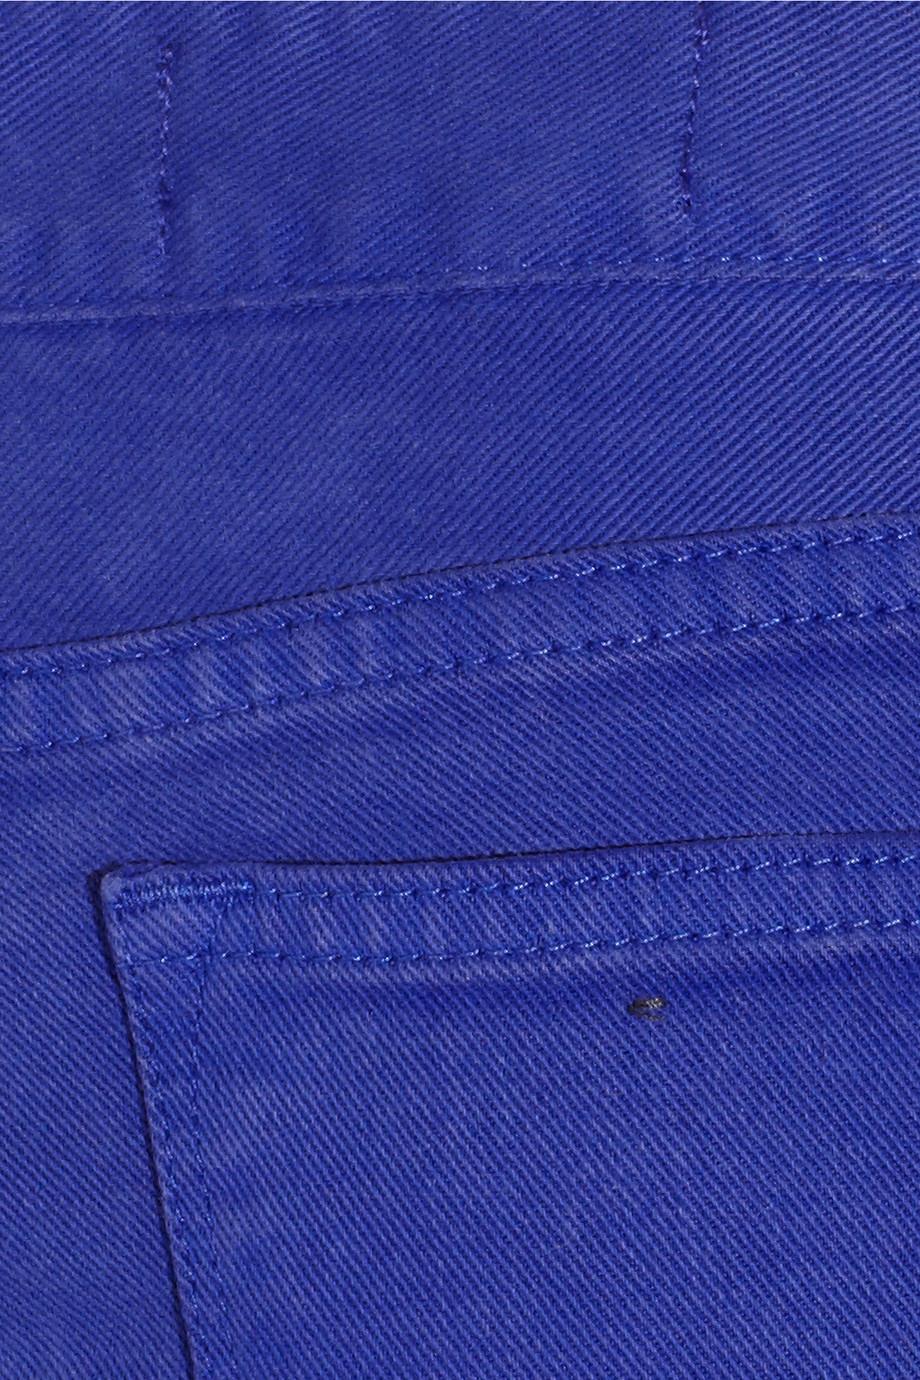 J.Crew Toothpick Midrise Skinny Jeans in Indigo (Blue)